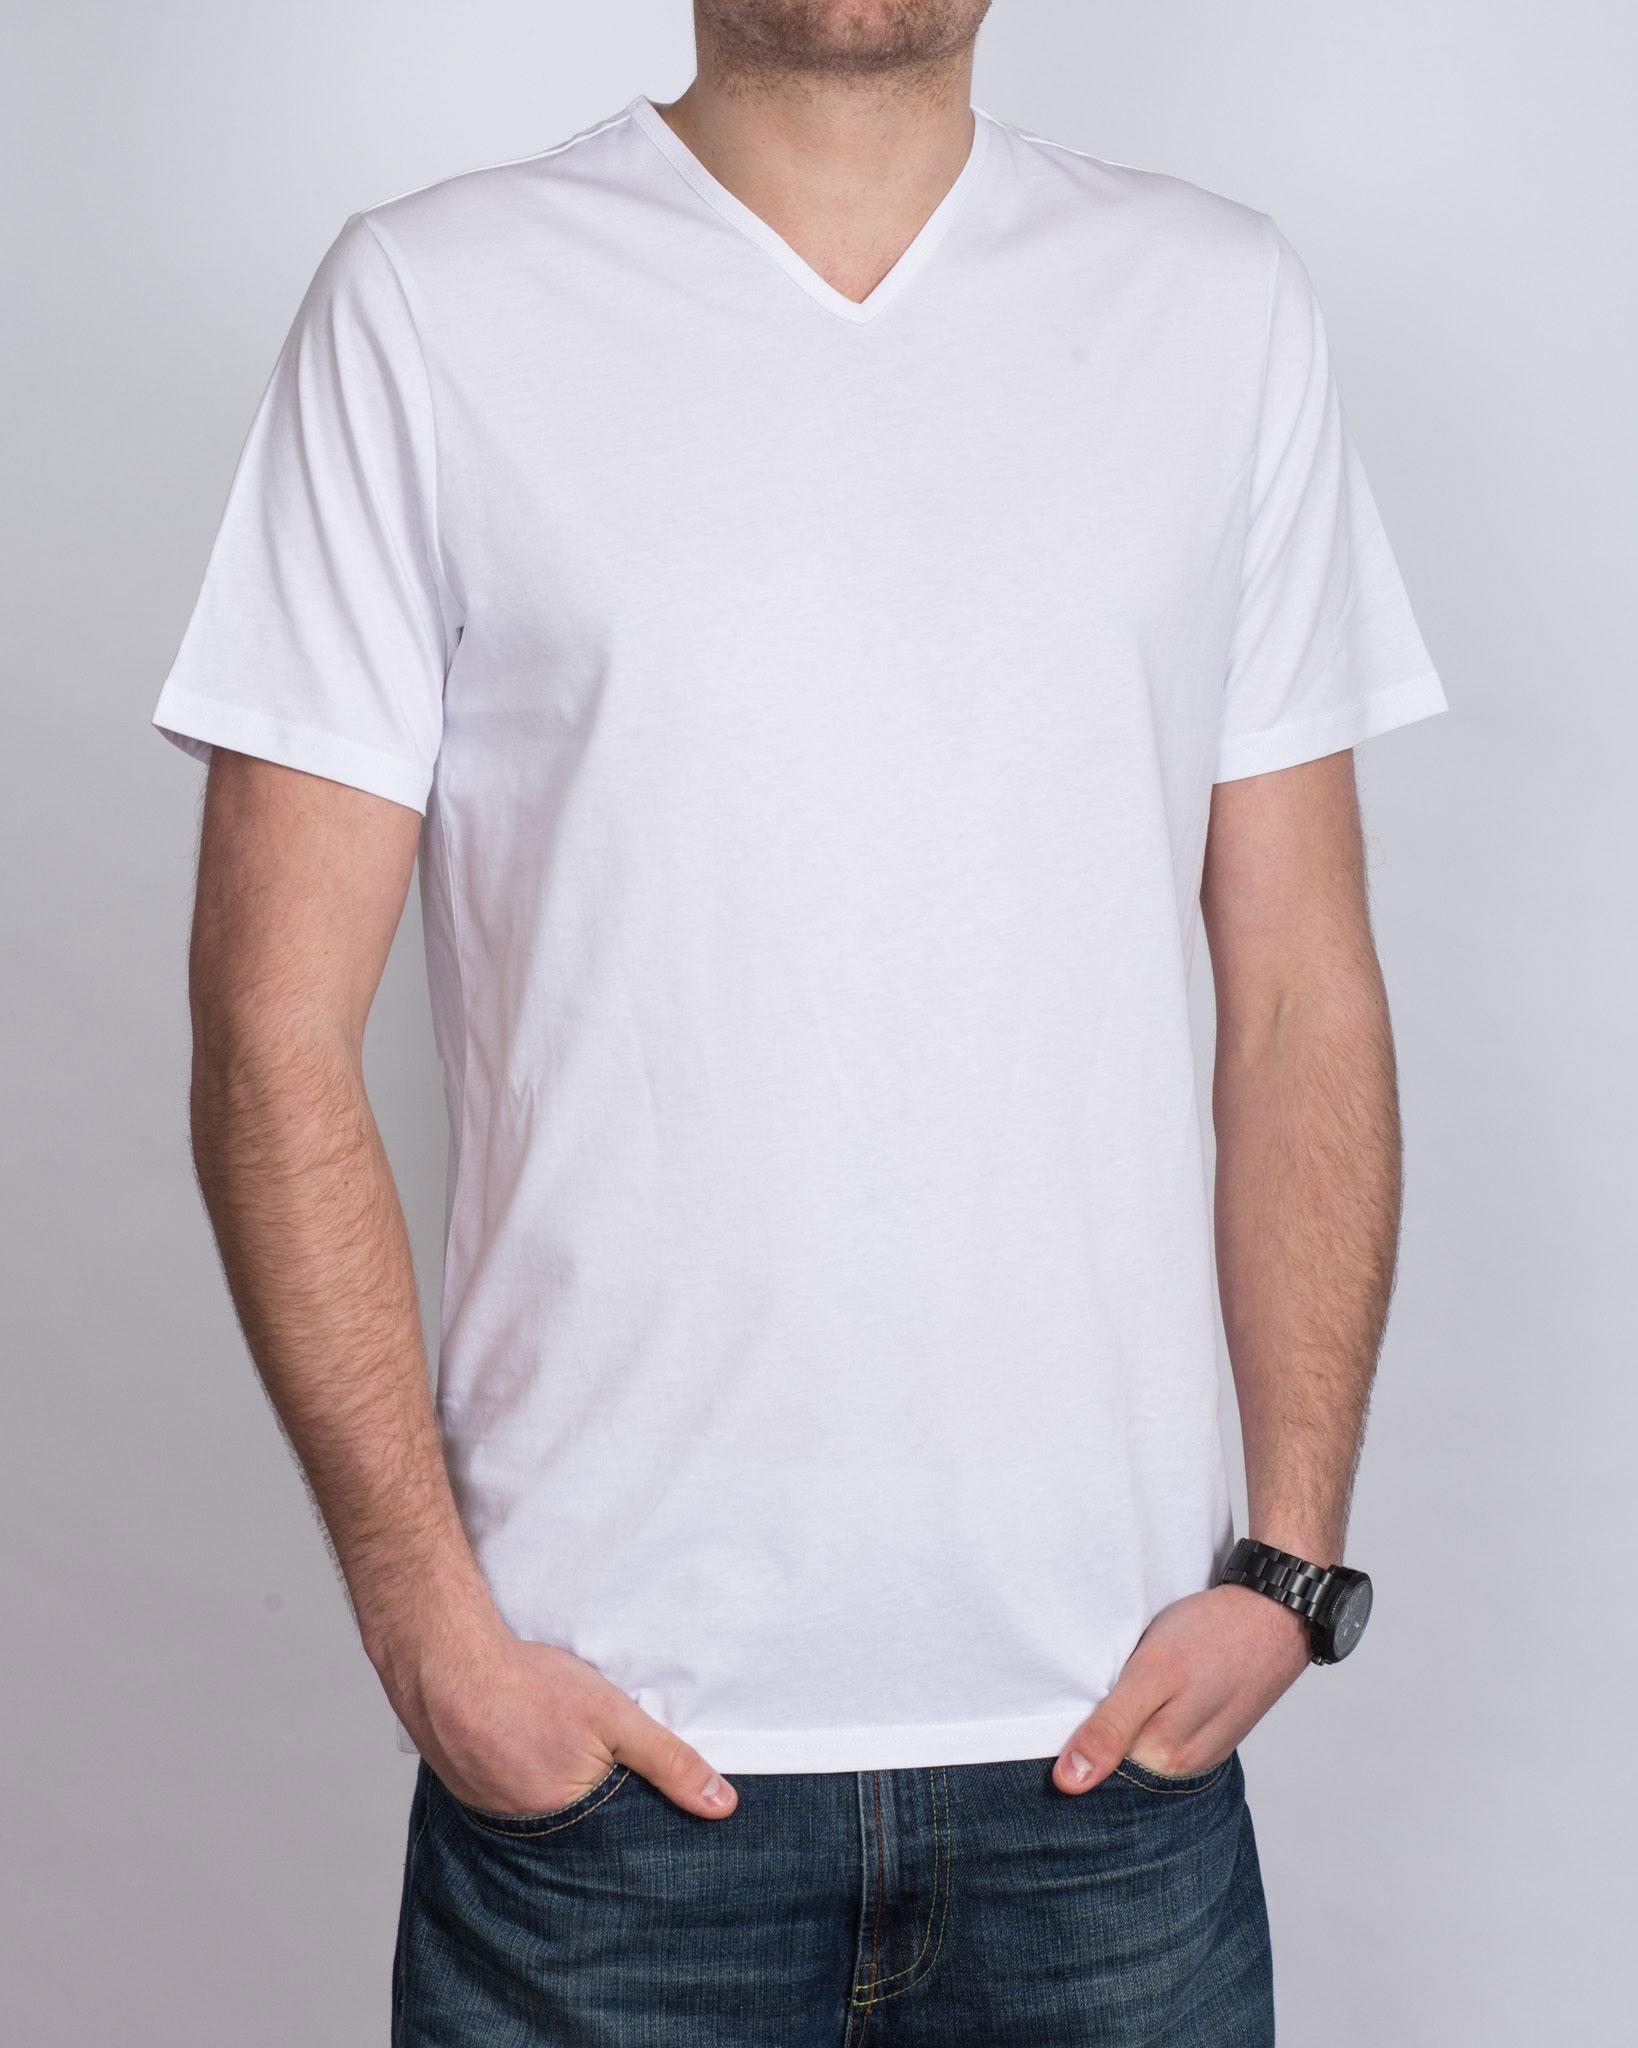 2T Tall V-Neck T-Shirt (white)